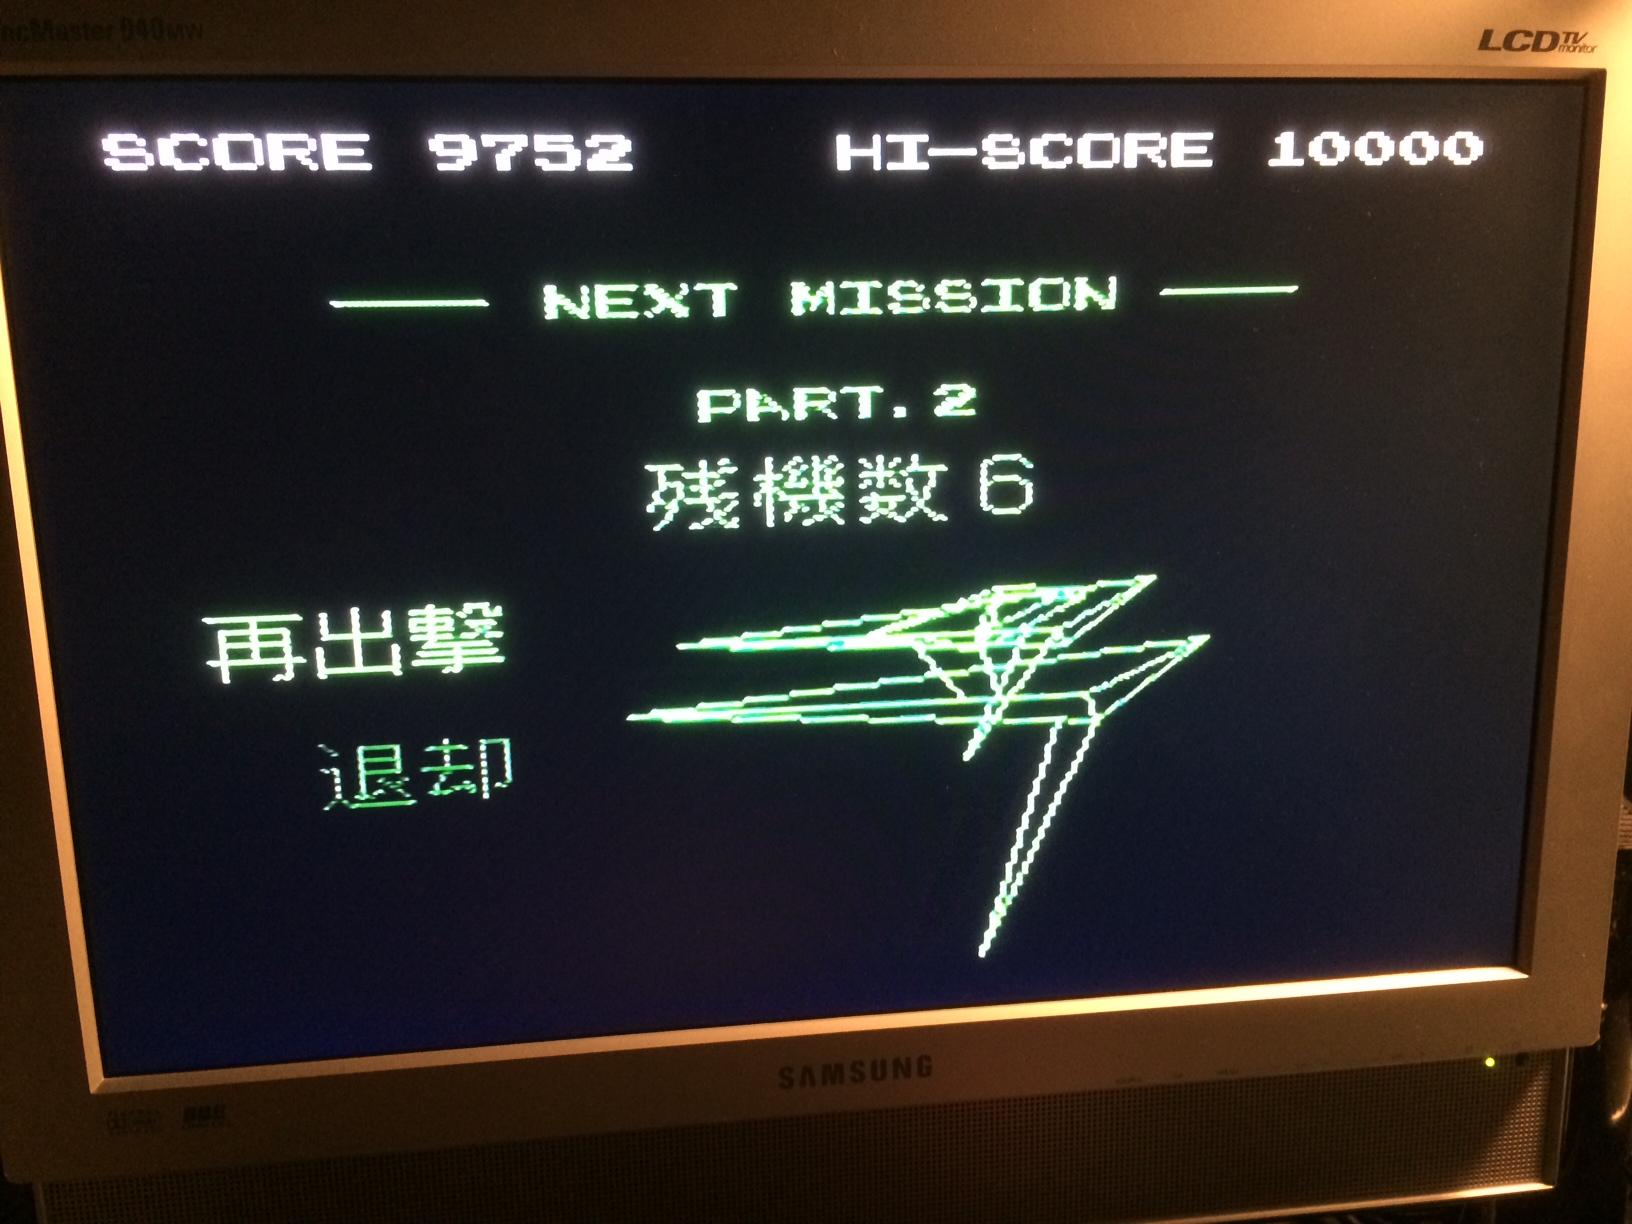 Serious: Space Invaders: Fukkatsu no Hi [Plus Mode] (TurboGrafx-16/PC Engine) 9,752 points on 2014-11-24 01:55:34